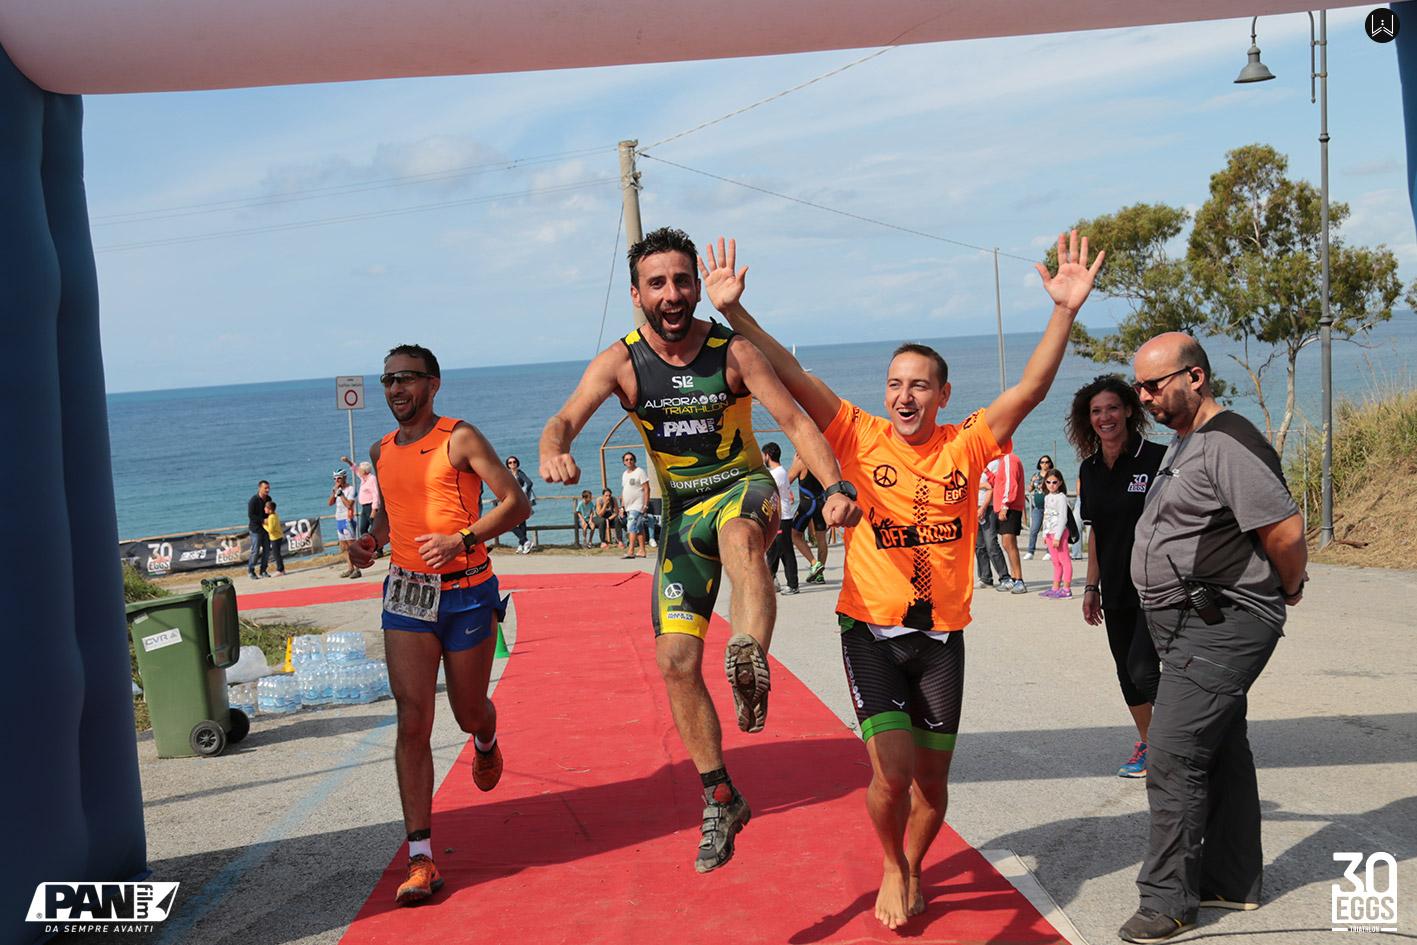 Staffettisti - 30EGGS Triathlon Cross Super Sprint